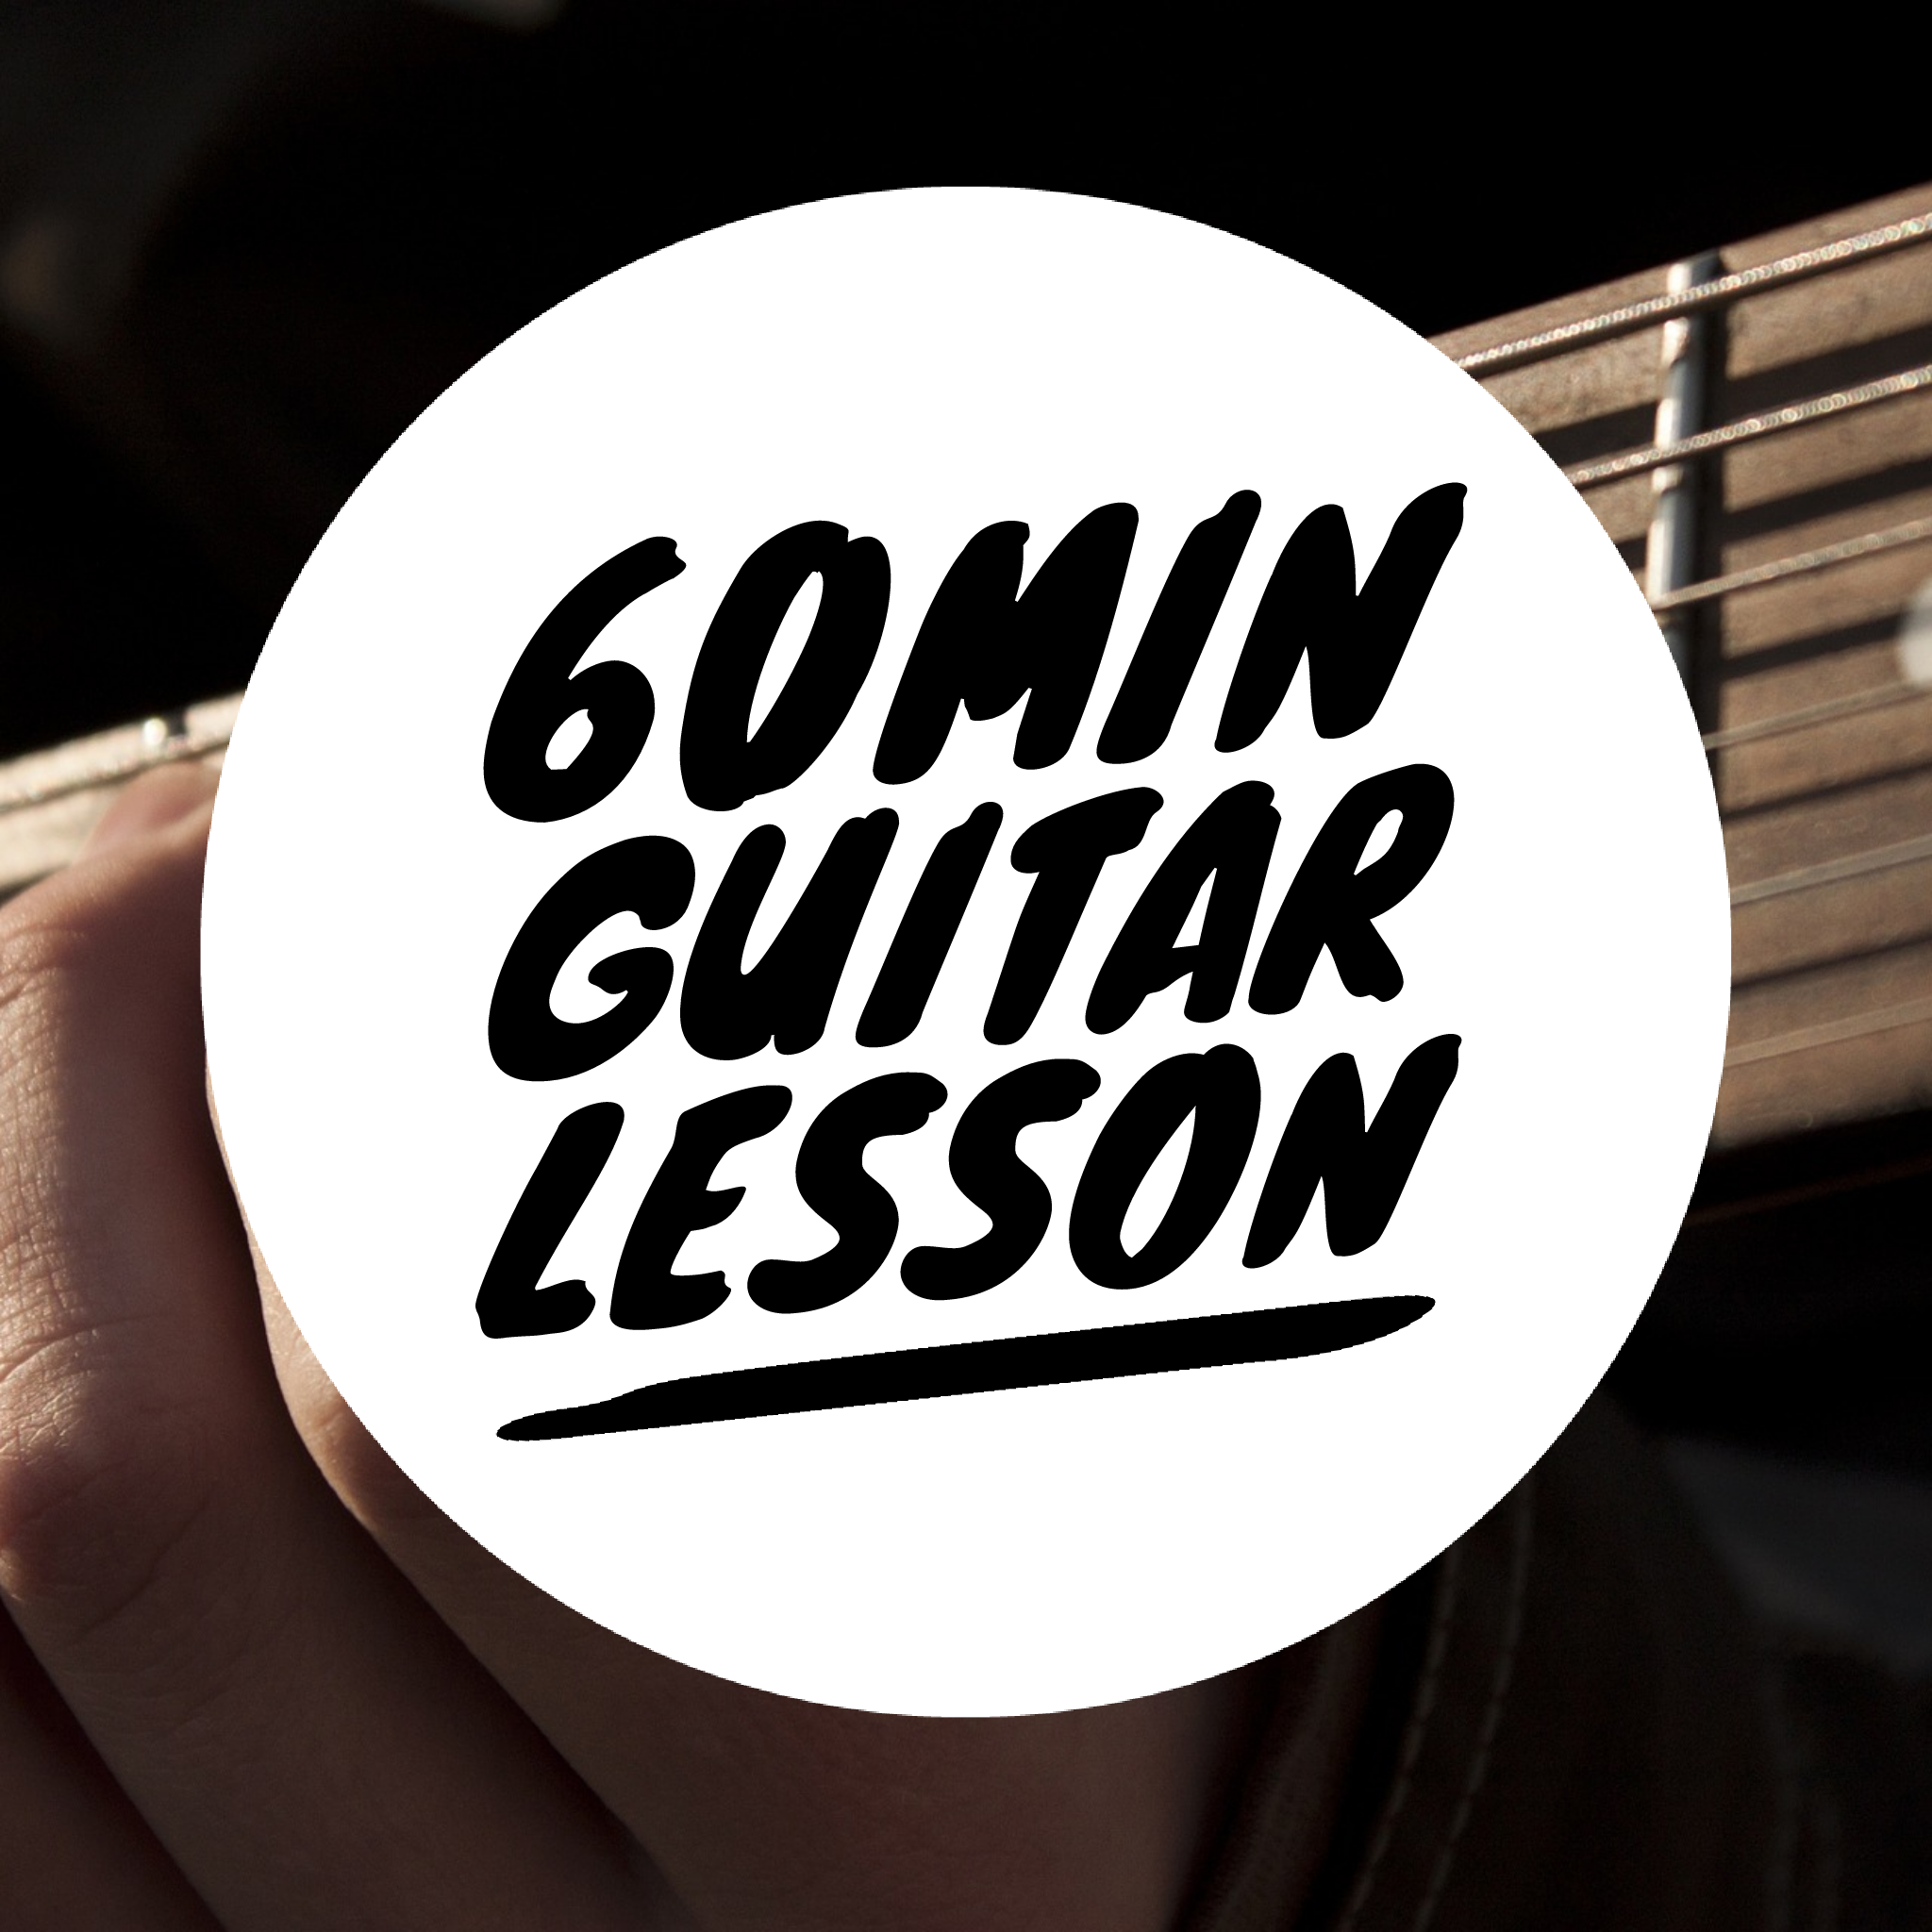 60 Minute Guitar Lesson